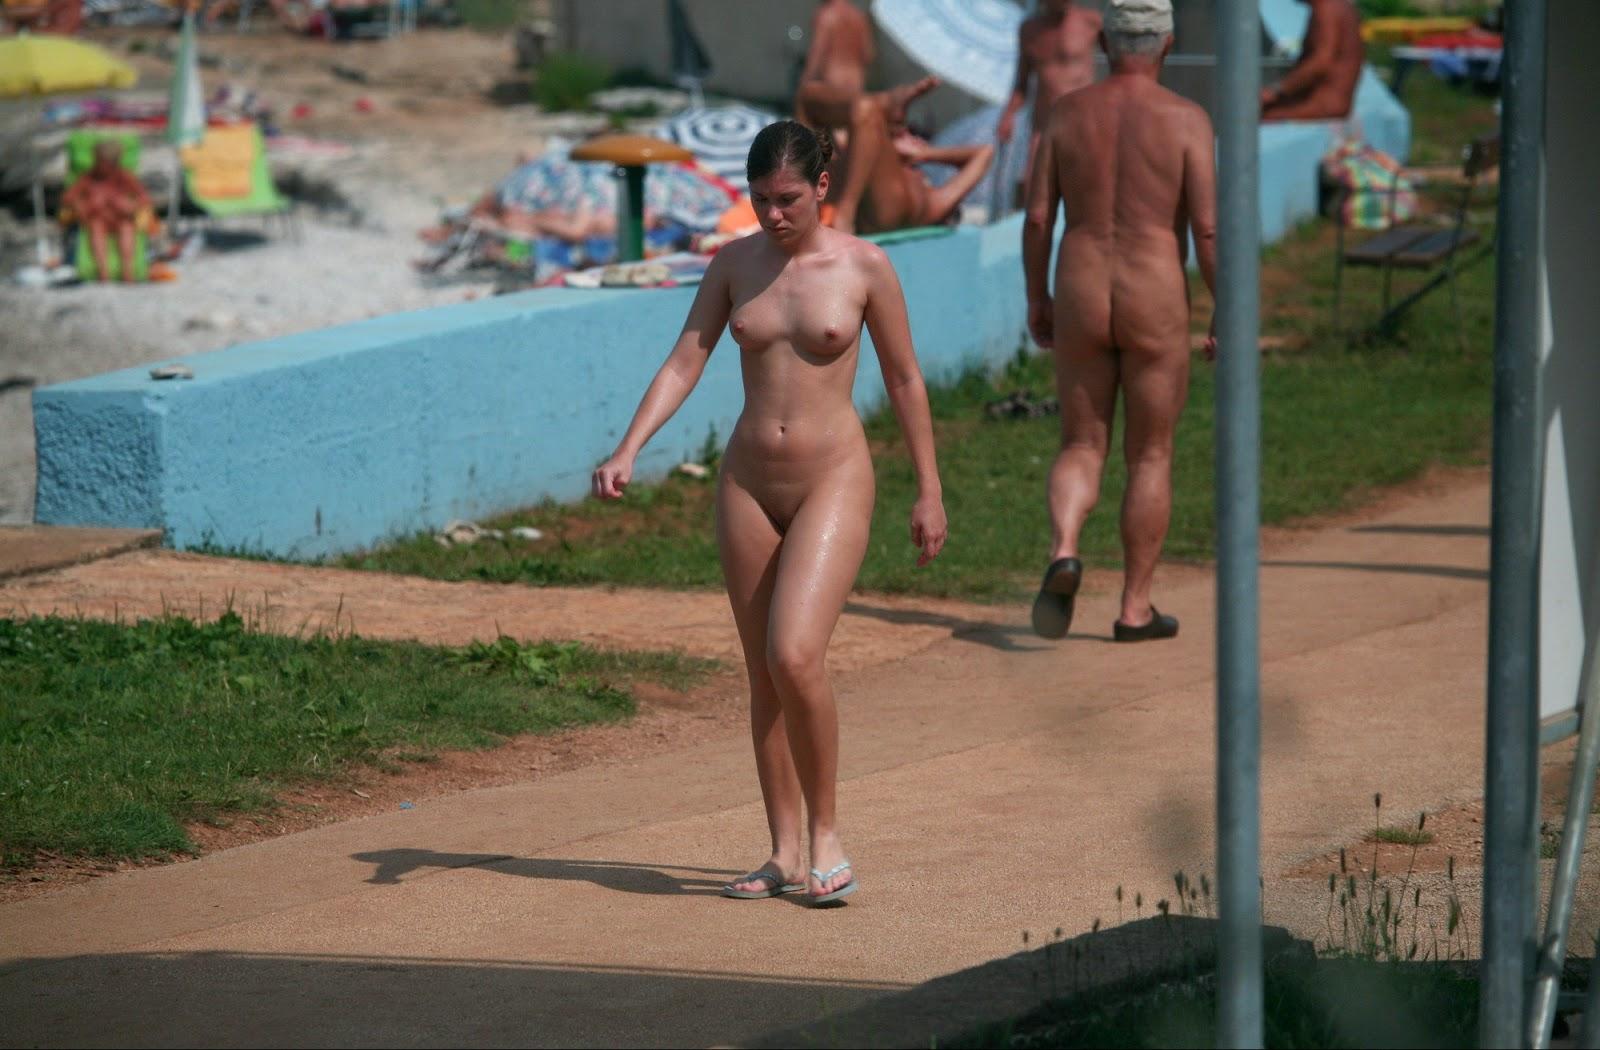 Hidden pool cabin sex 1 7